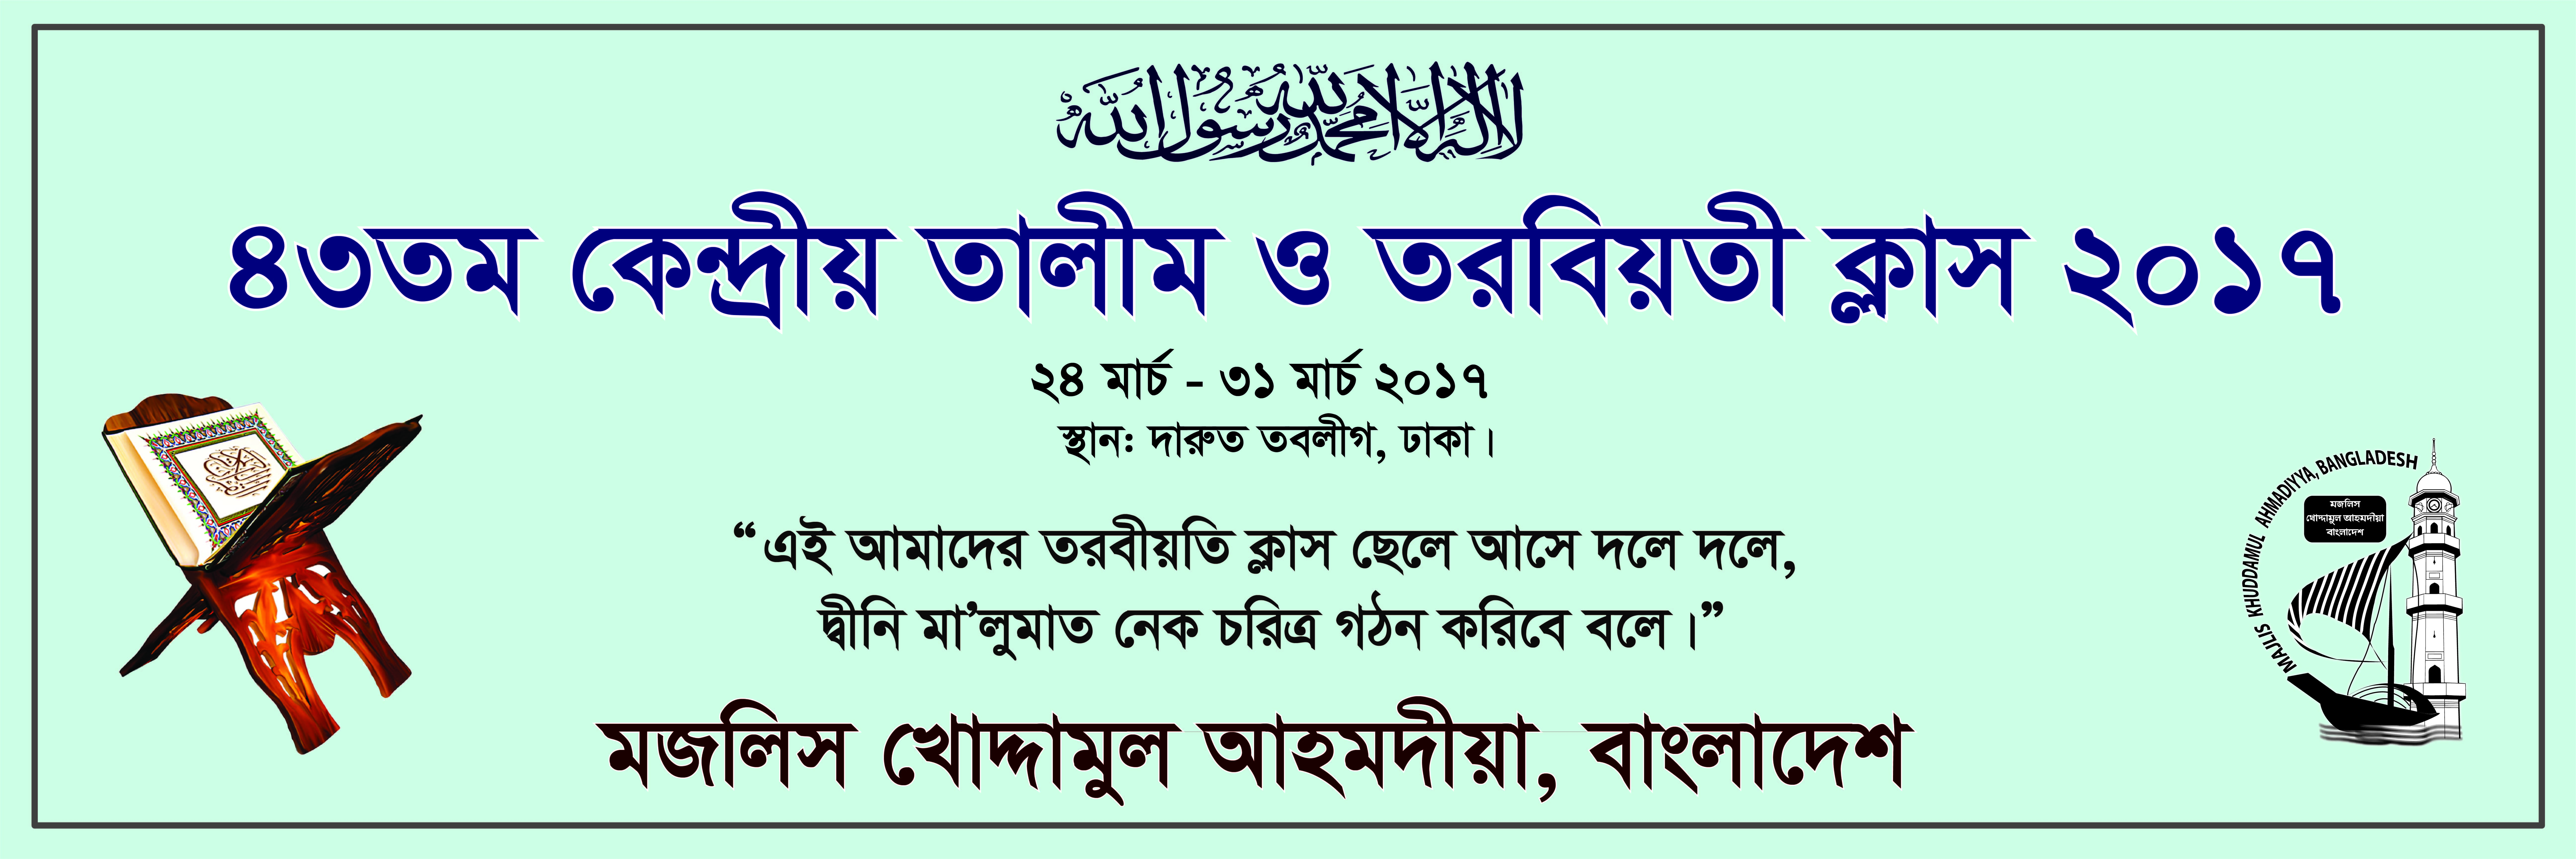 43rd National Taleem and Tarbiyyati class 2017, Majlis Khuddamul Ahmadiyya Bangladesh